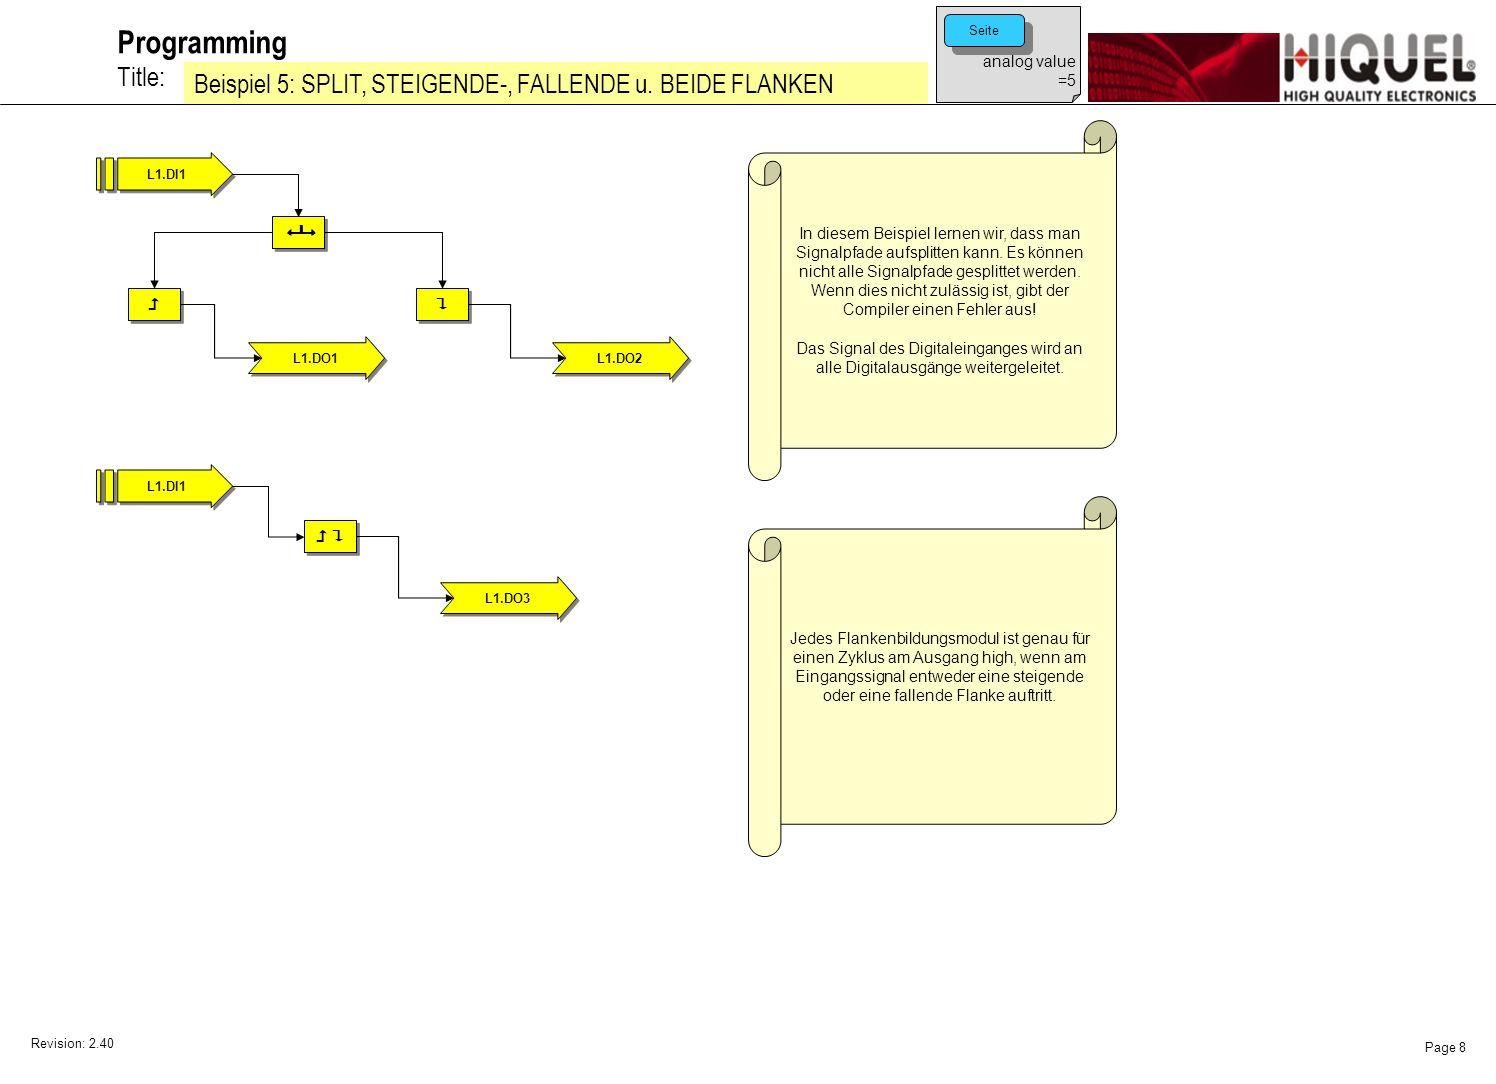 Revision: 2.40 Page 8 Title: Programming Beispiel 5: SPLIT, STEIGENDE-, FALLENDE u.